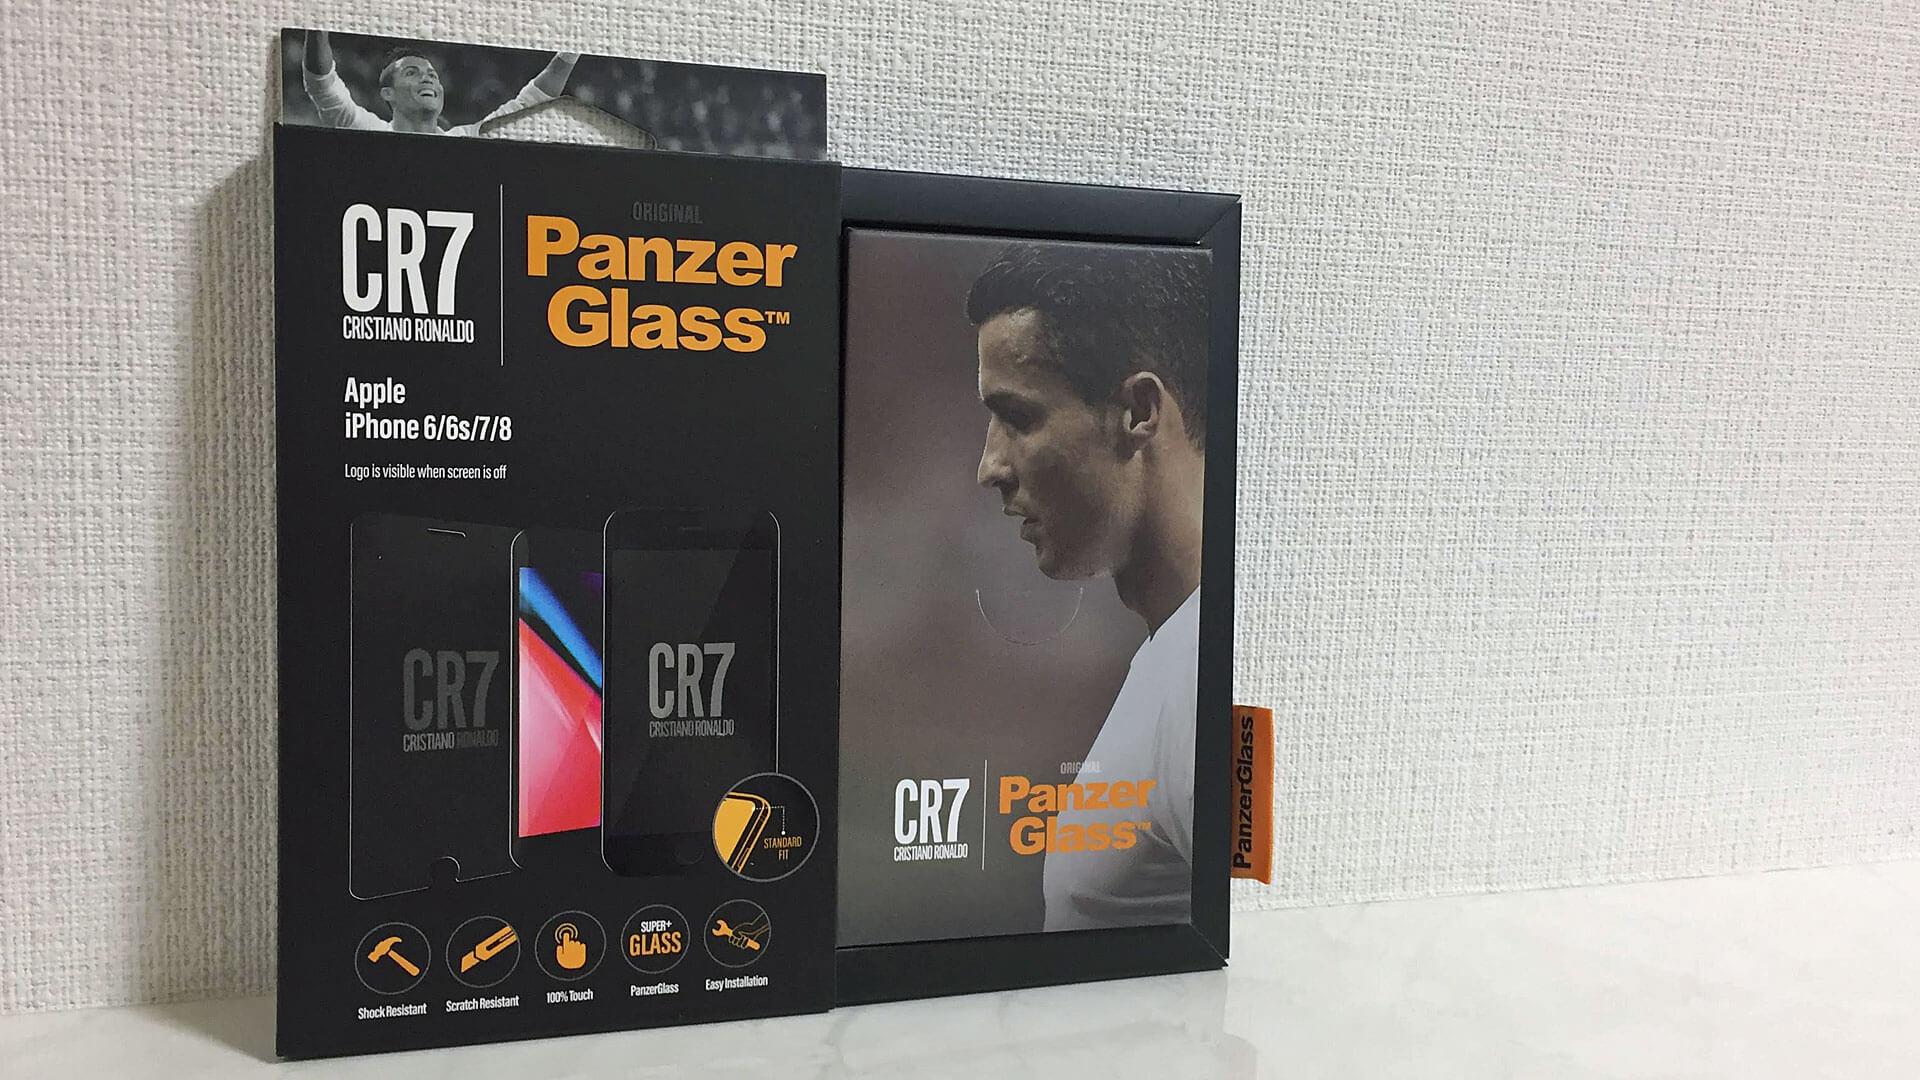 PanzerGlass CR7 - iPhone用スクリーンプロテクター!